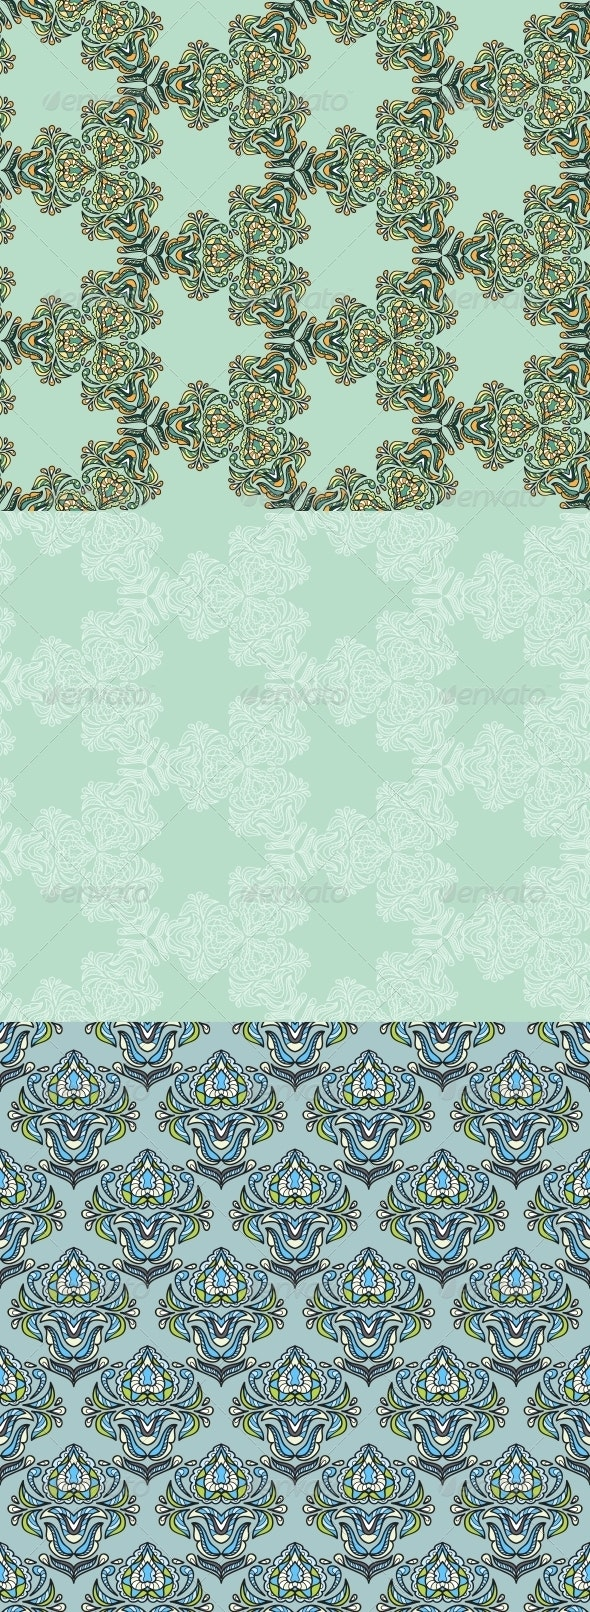 Seamless Abstract Kaleidoscope Patterns. - Patterns Decorative